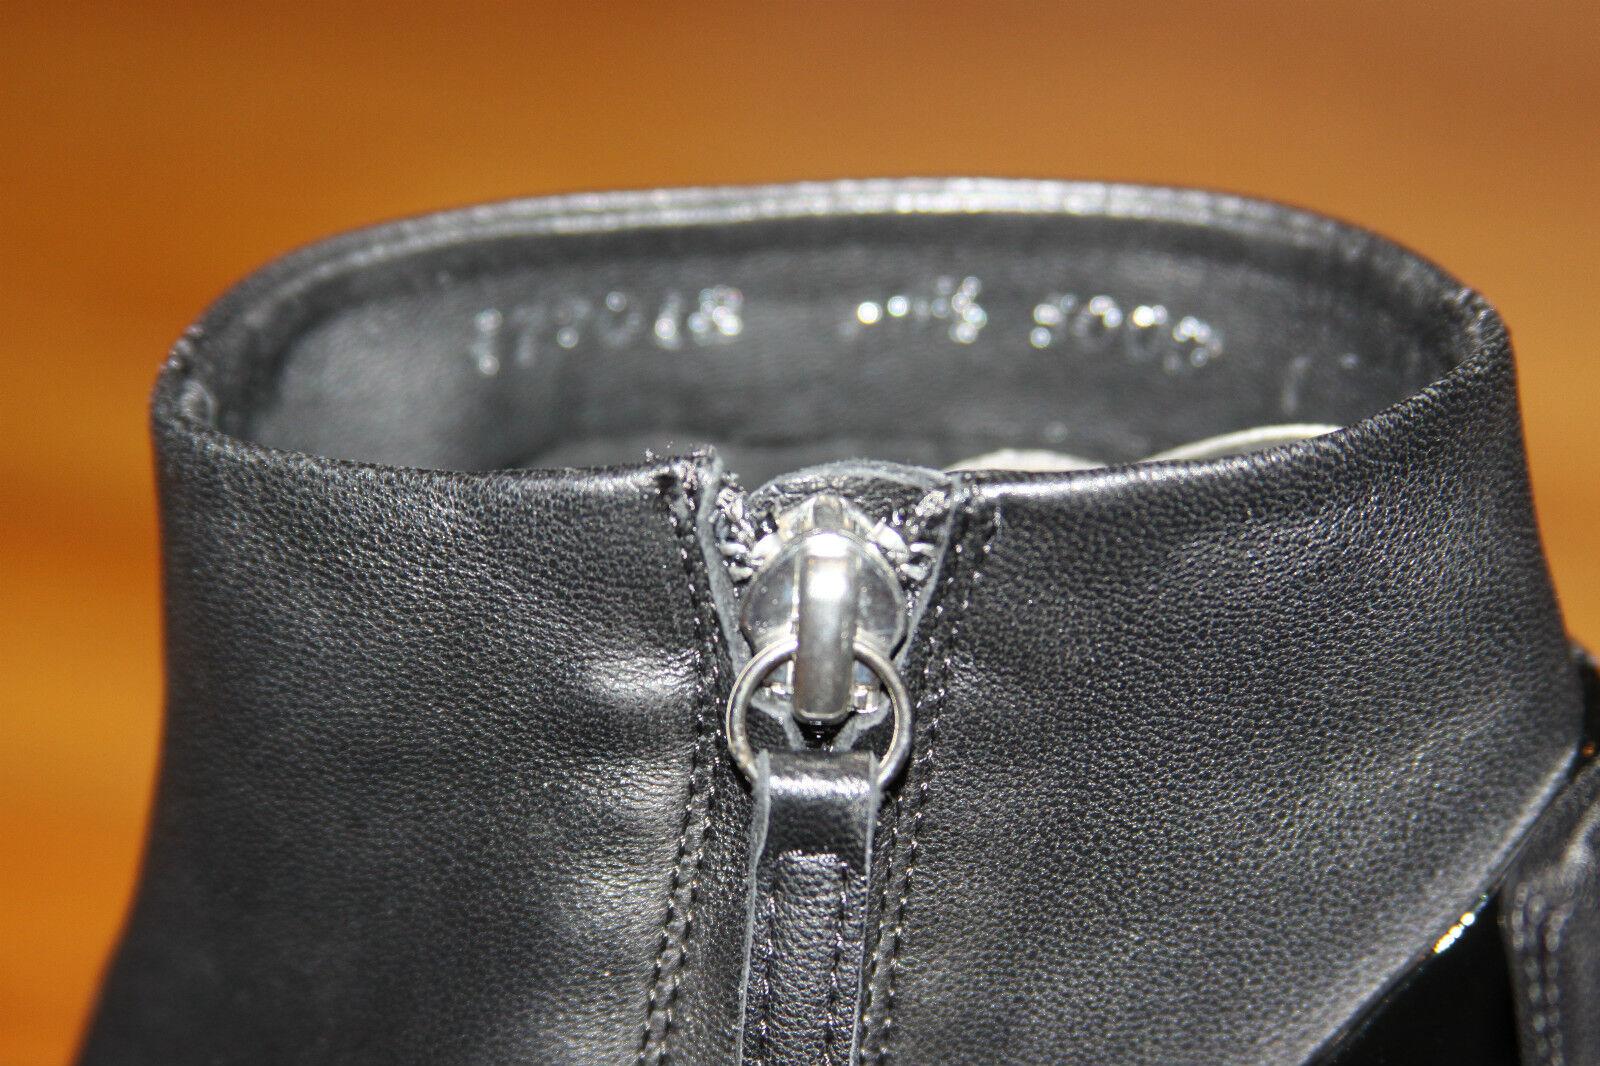 GIUSEPPE GIUSEPPE GIUSEPPE ZANOTTI BALCK LEATHER ANKLE Stiefel Größe 36.5 db777b